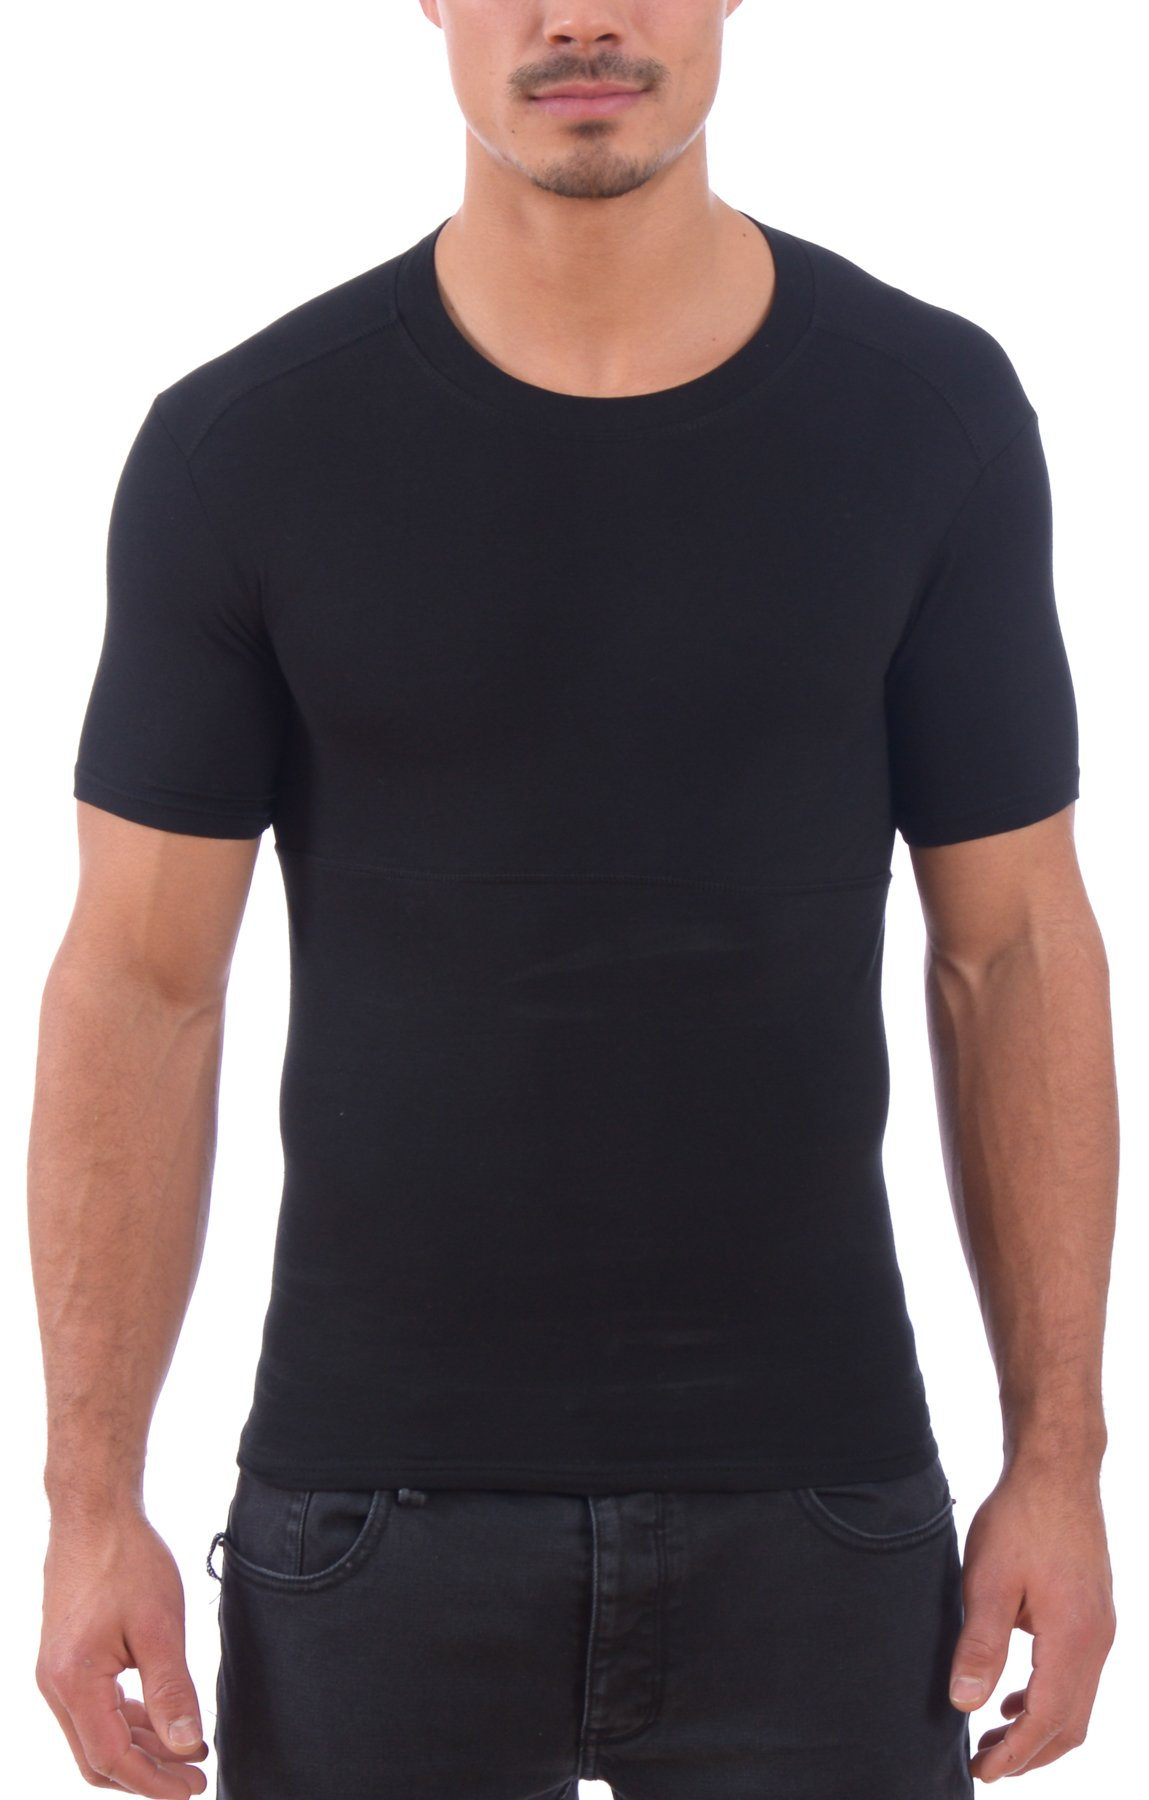 Powerbody Men's Instaslim Shapewear Compression Sculpting Crew Neck T-Shirts (Black, 3X)